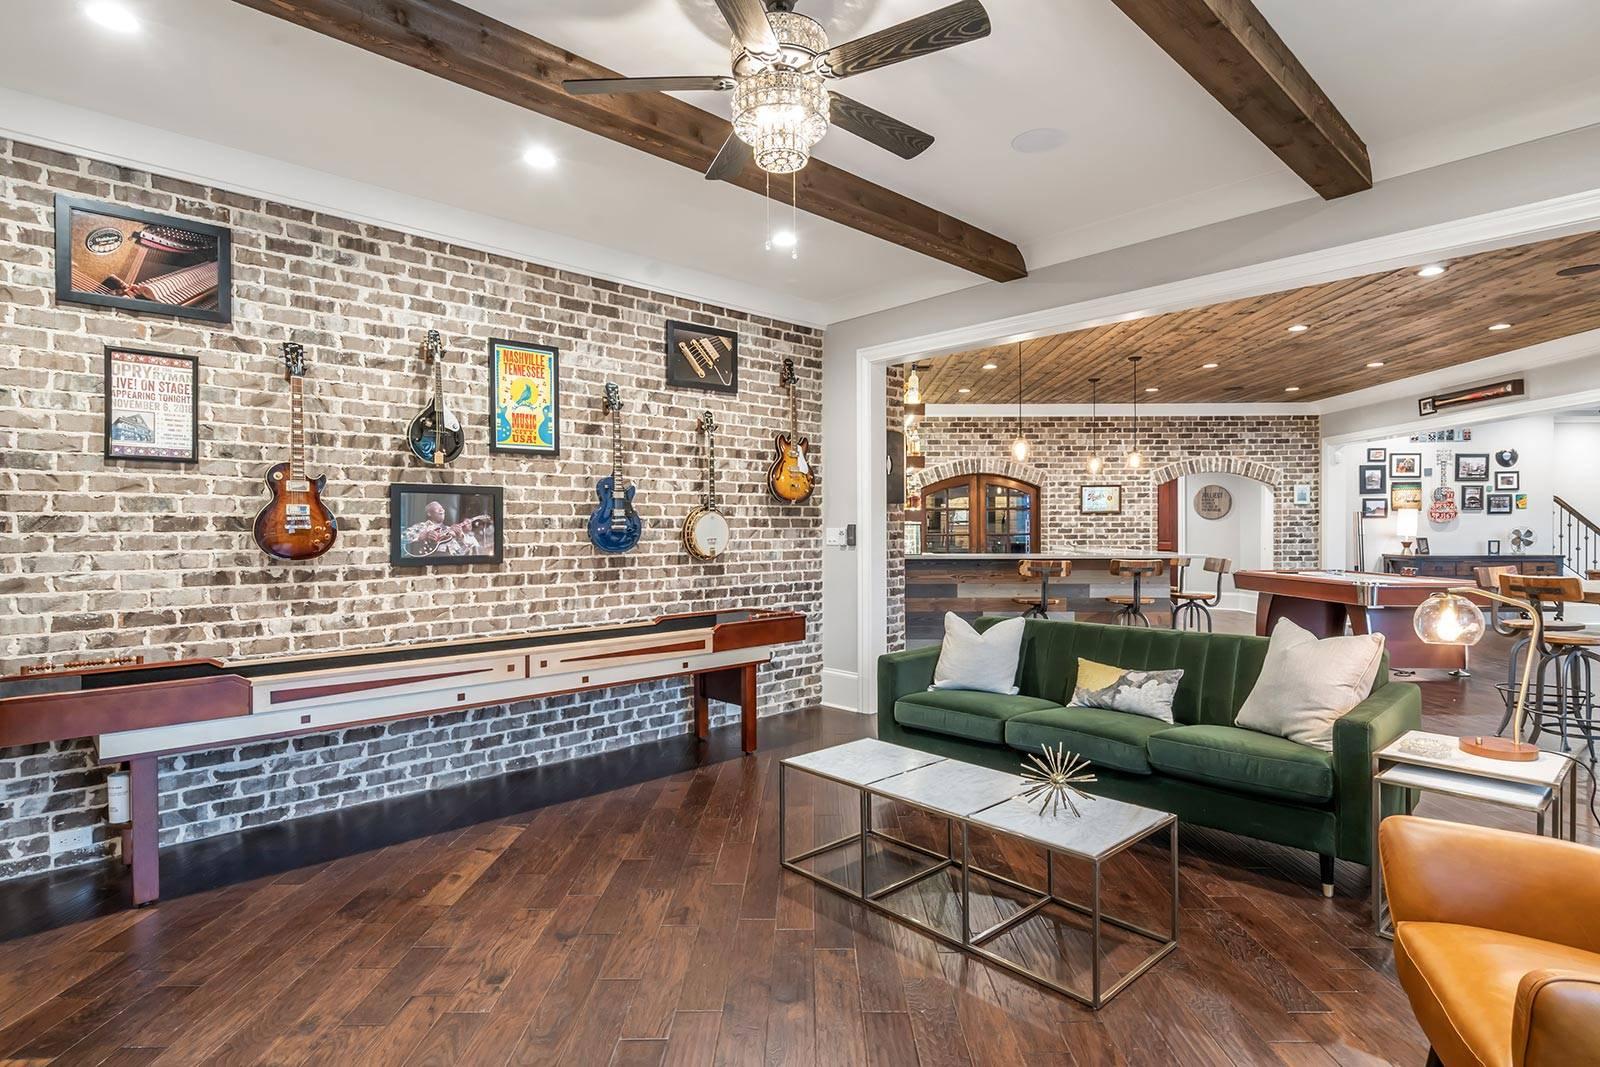 Stonecrest Homes | Marketing by Clementine Creative Agency | Atlanta, GA